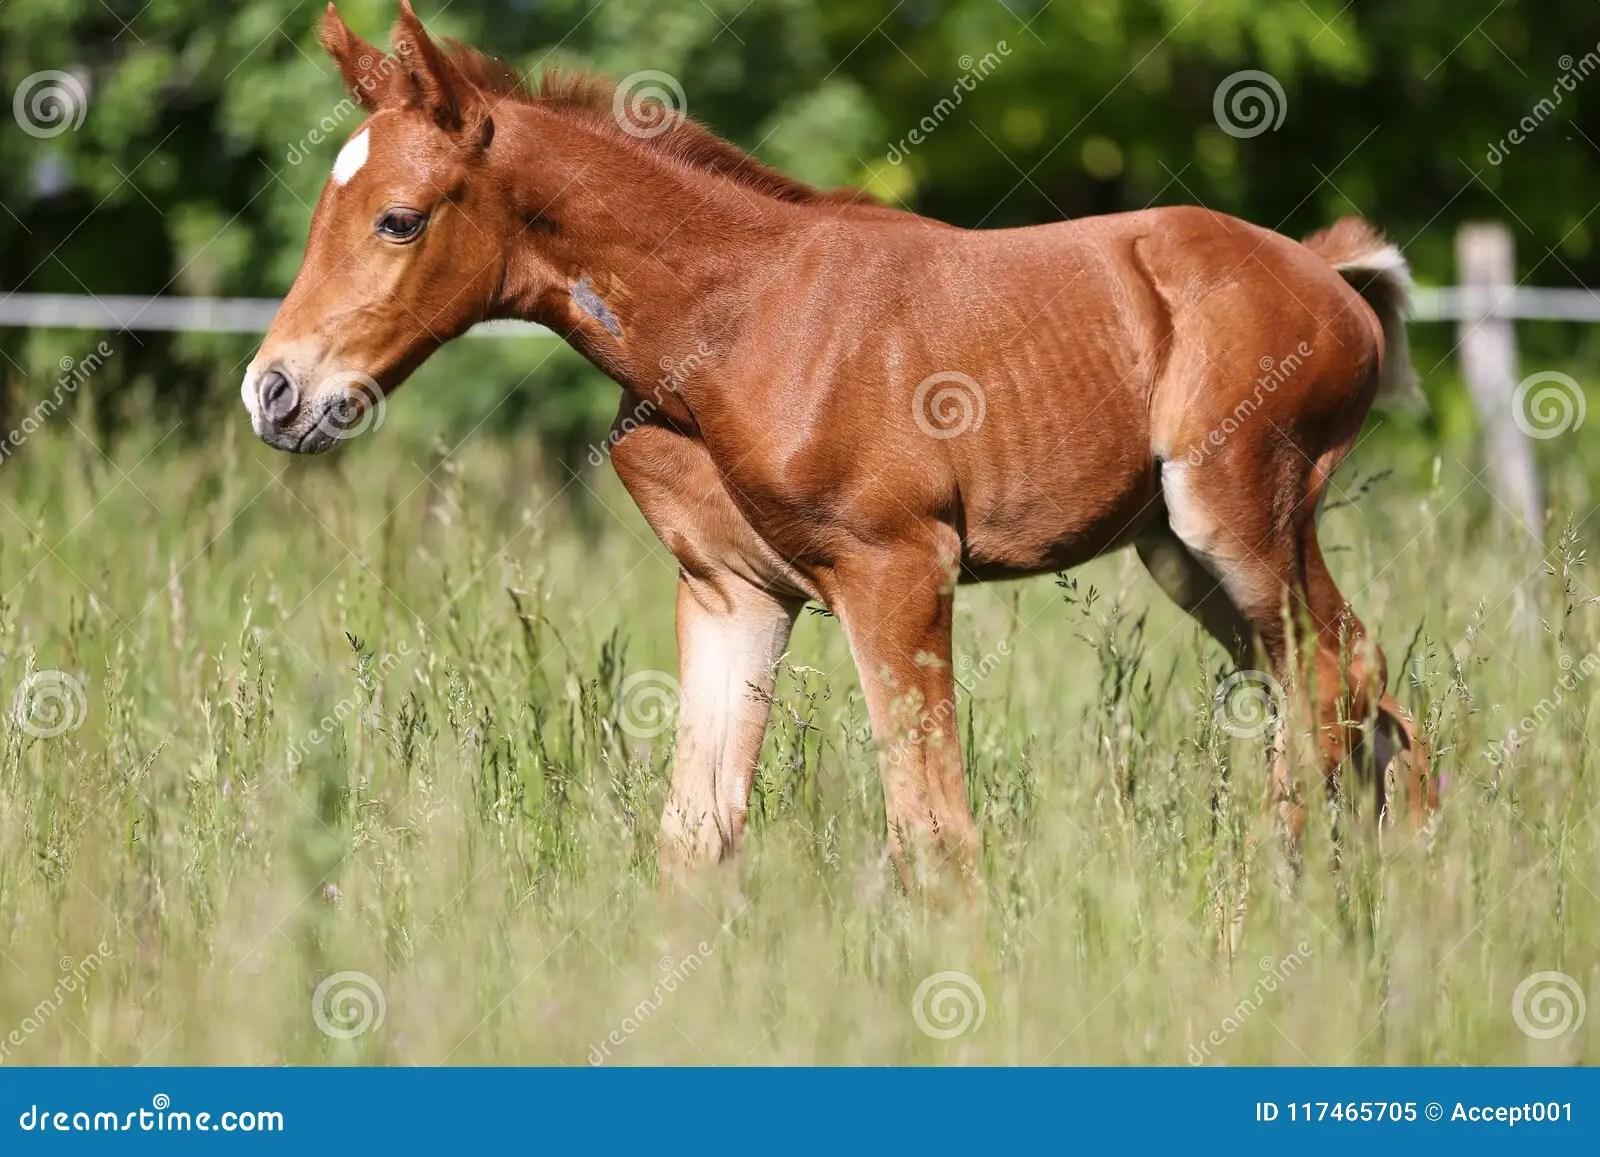 Newborn Chestnut Baby Horses